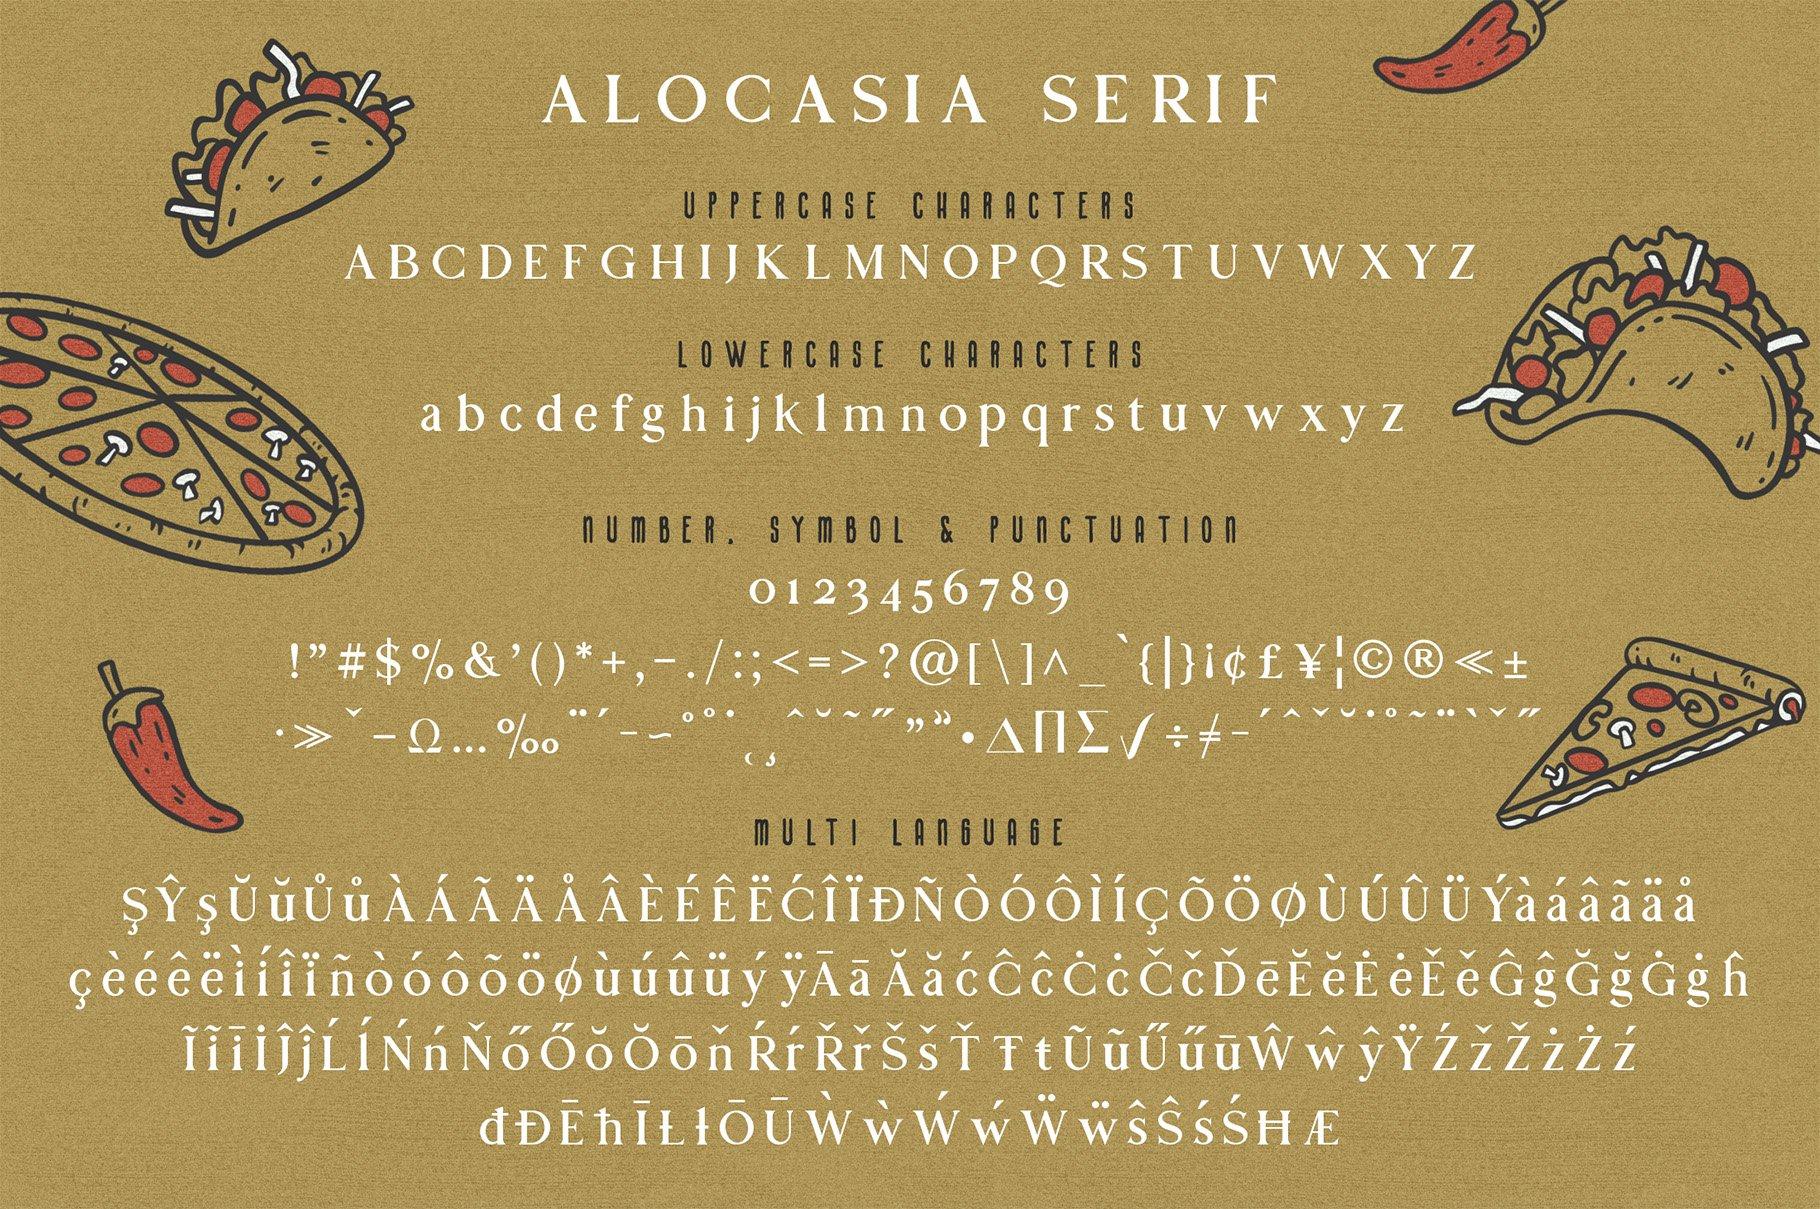 Alocasia-Trio Font Combination example image 13